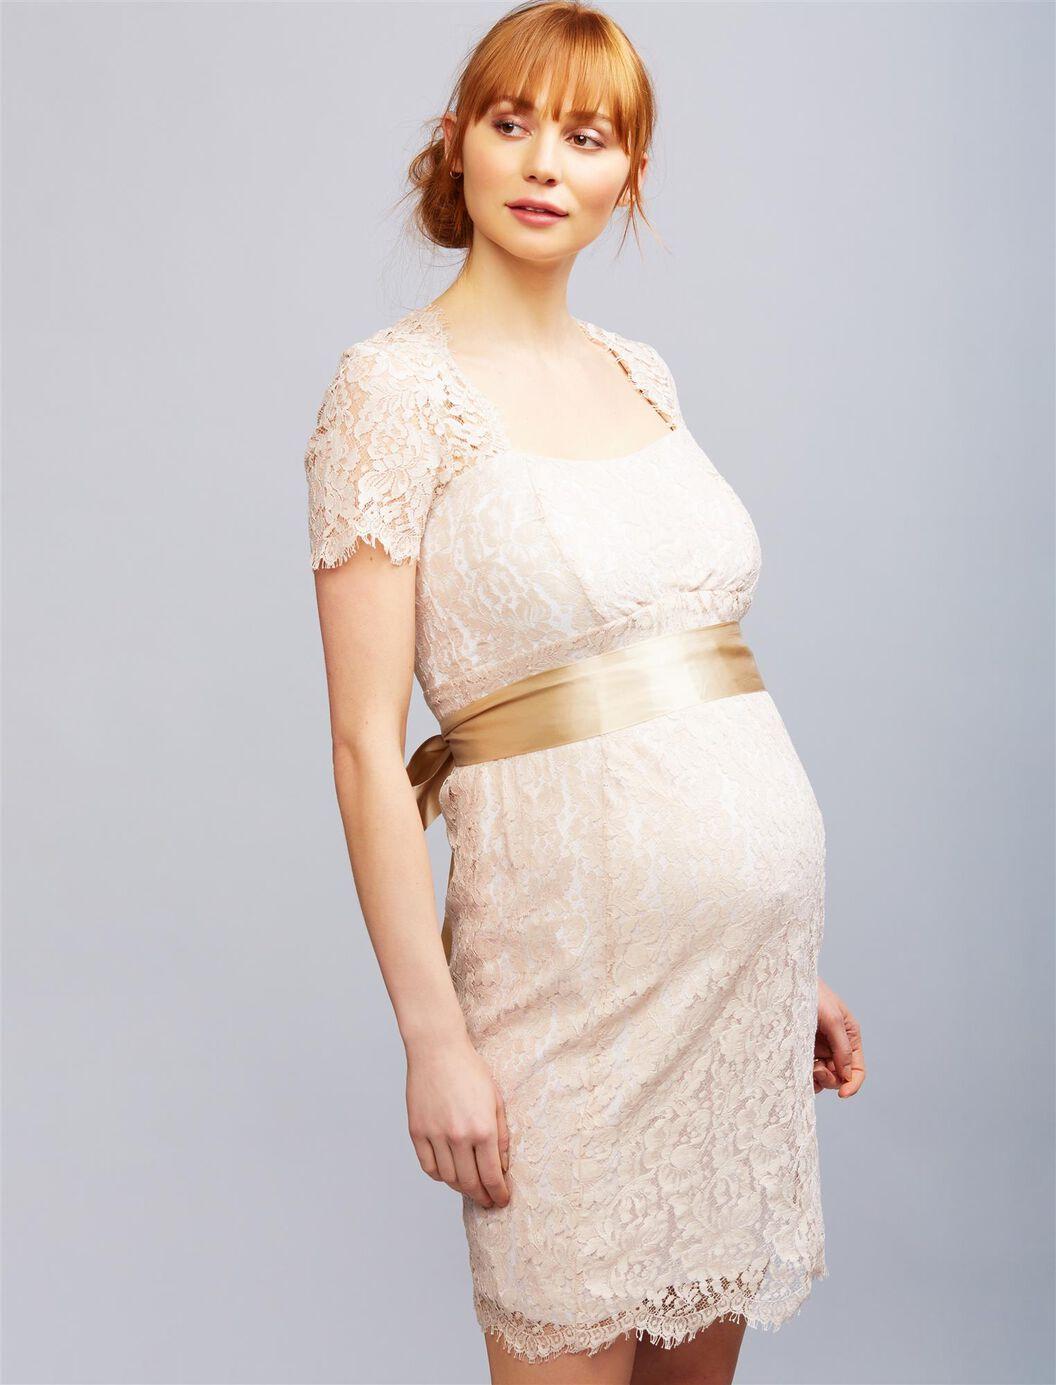 Seraphine luxe allegra maternity dress destination maternity seraphine luxe allegra maternity dress white ombrellifo Images